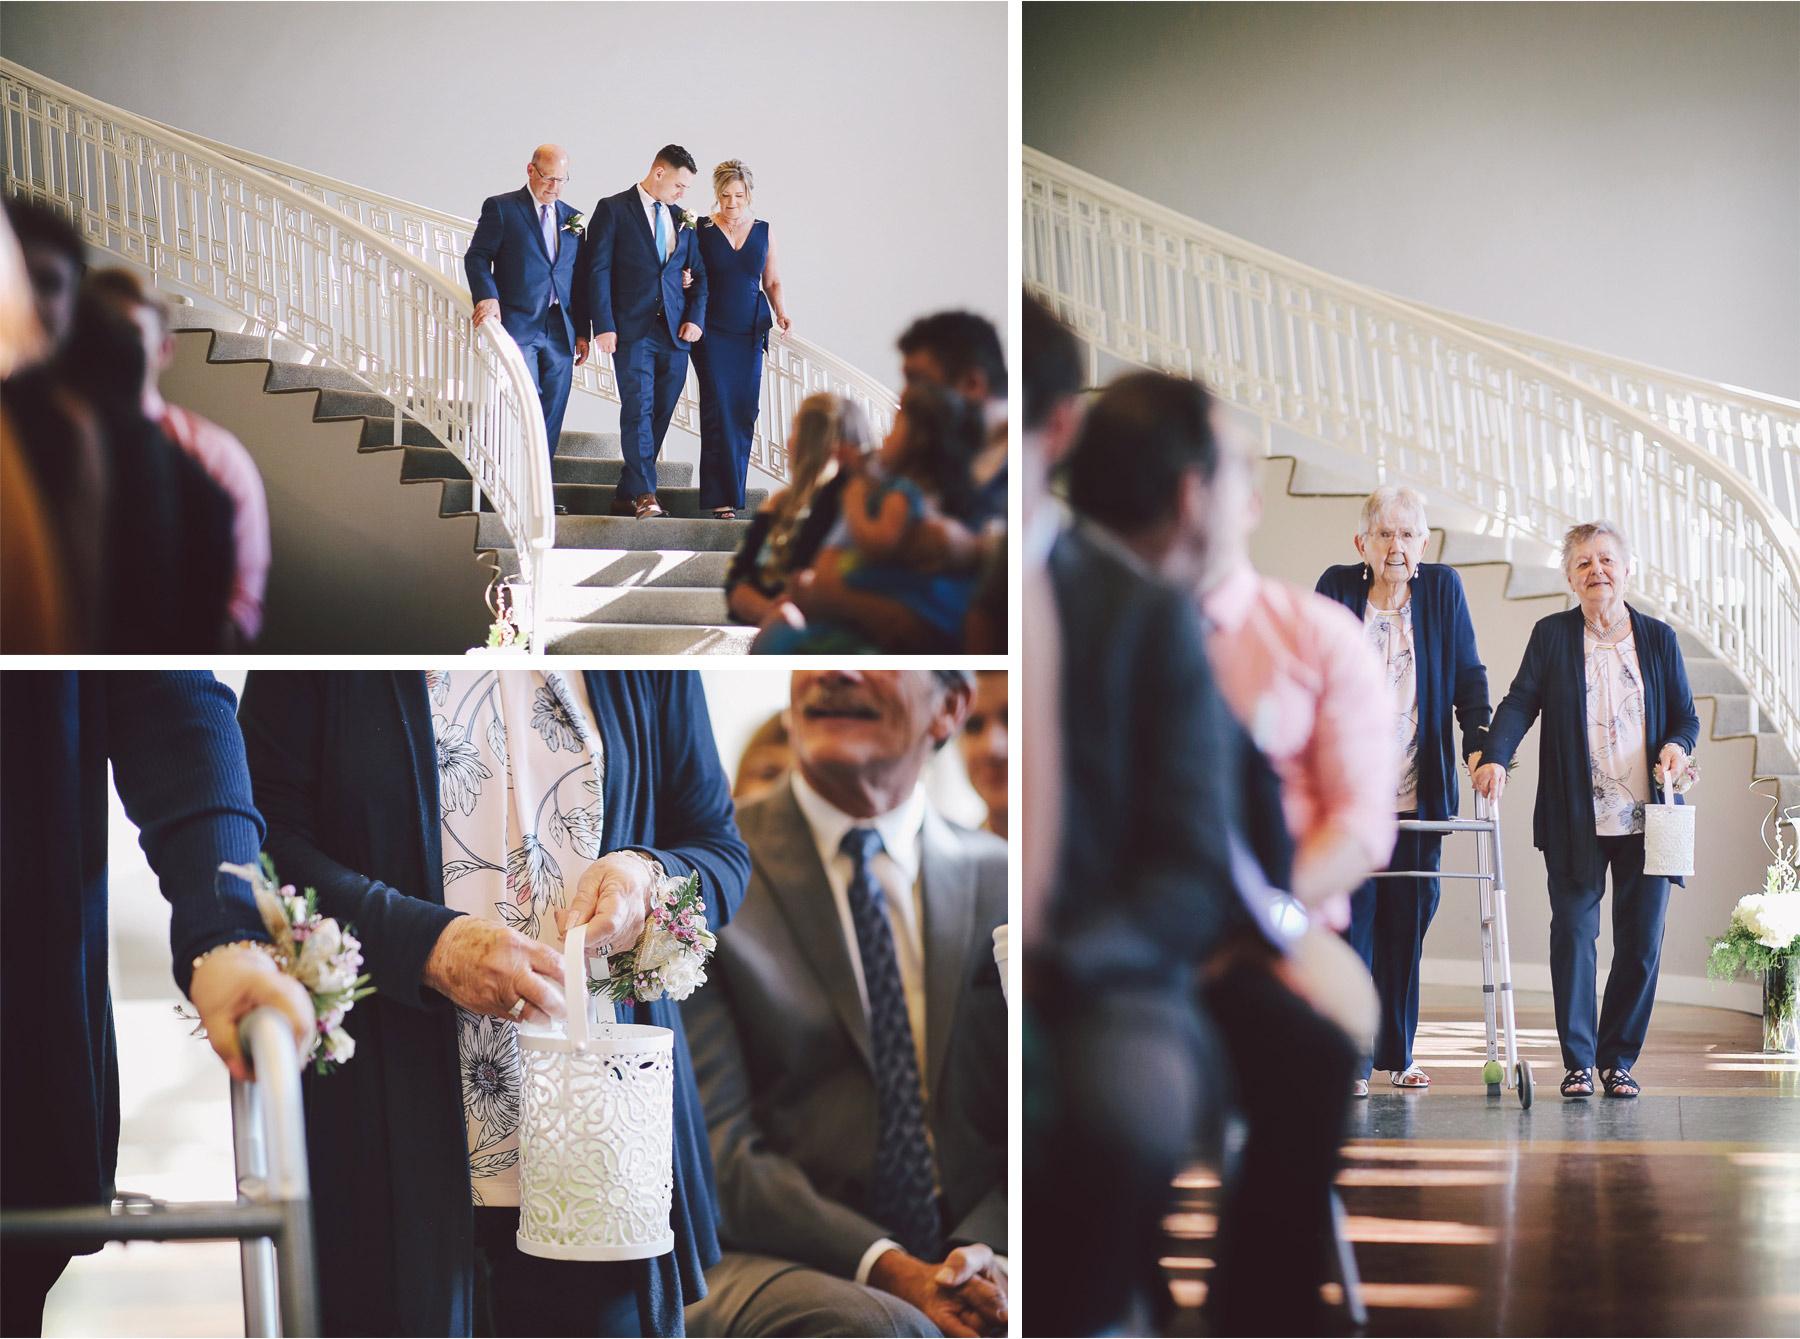 11-Minneapolis-Minnesota-Wedding-Andrew-Vick-Photography-Calhoun-Beach-Club-Ceremony-Staircase-Flowergirls-Grandmother-Samantha-and-Ryan.jpg